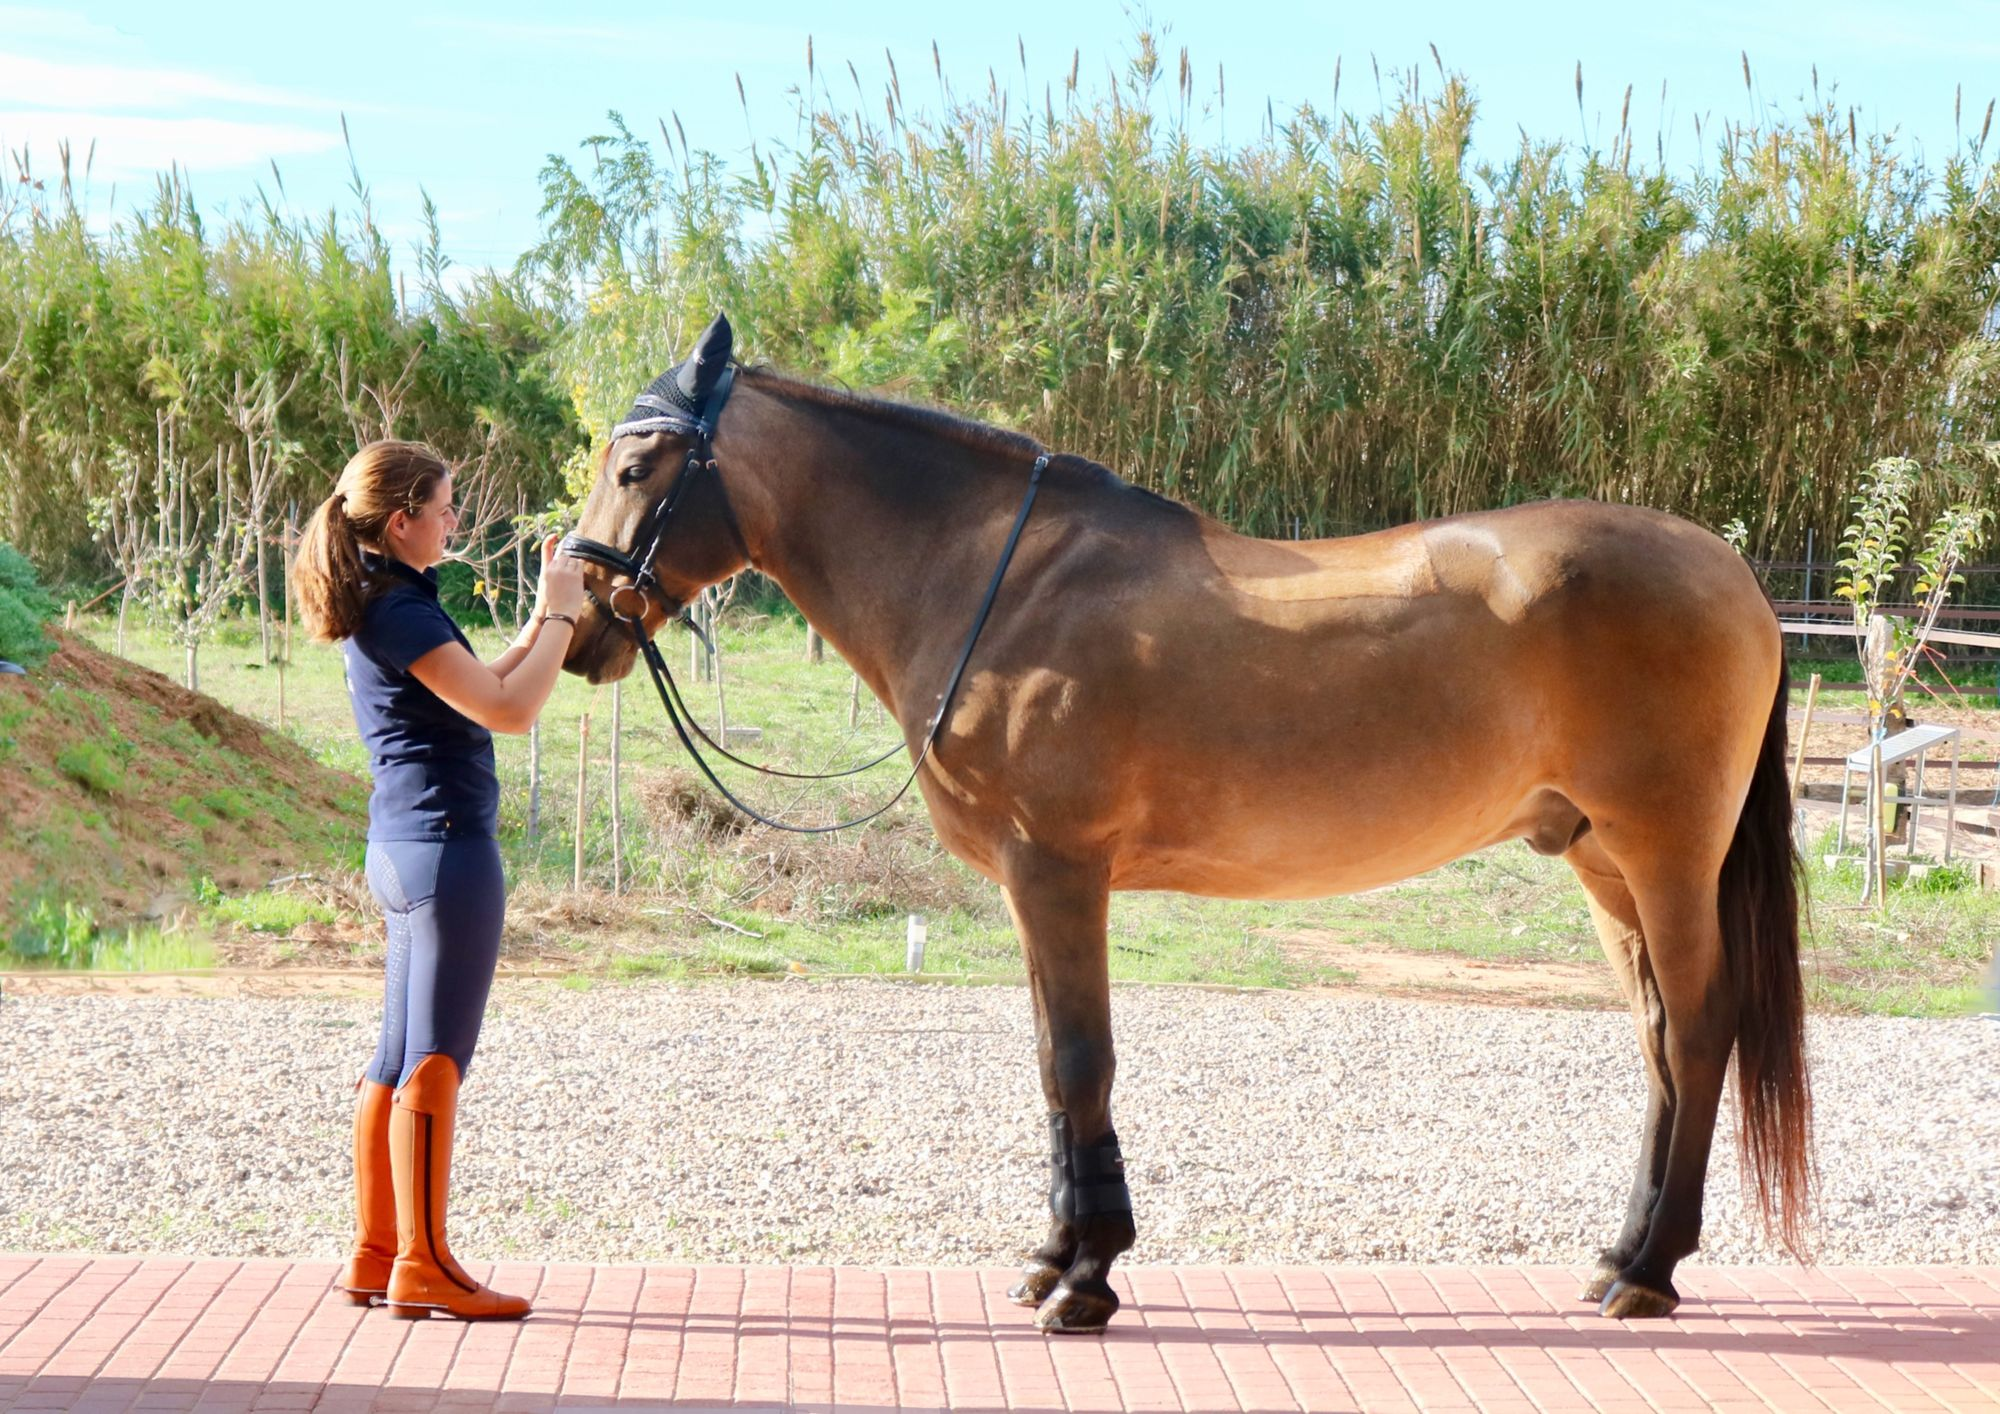 CSI2* VILAMOURA SUMMER TOUR JUMPING | 3.25 julio 20 @ Vilamoura Equestrian Centre, Portugal